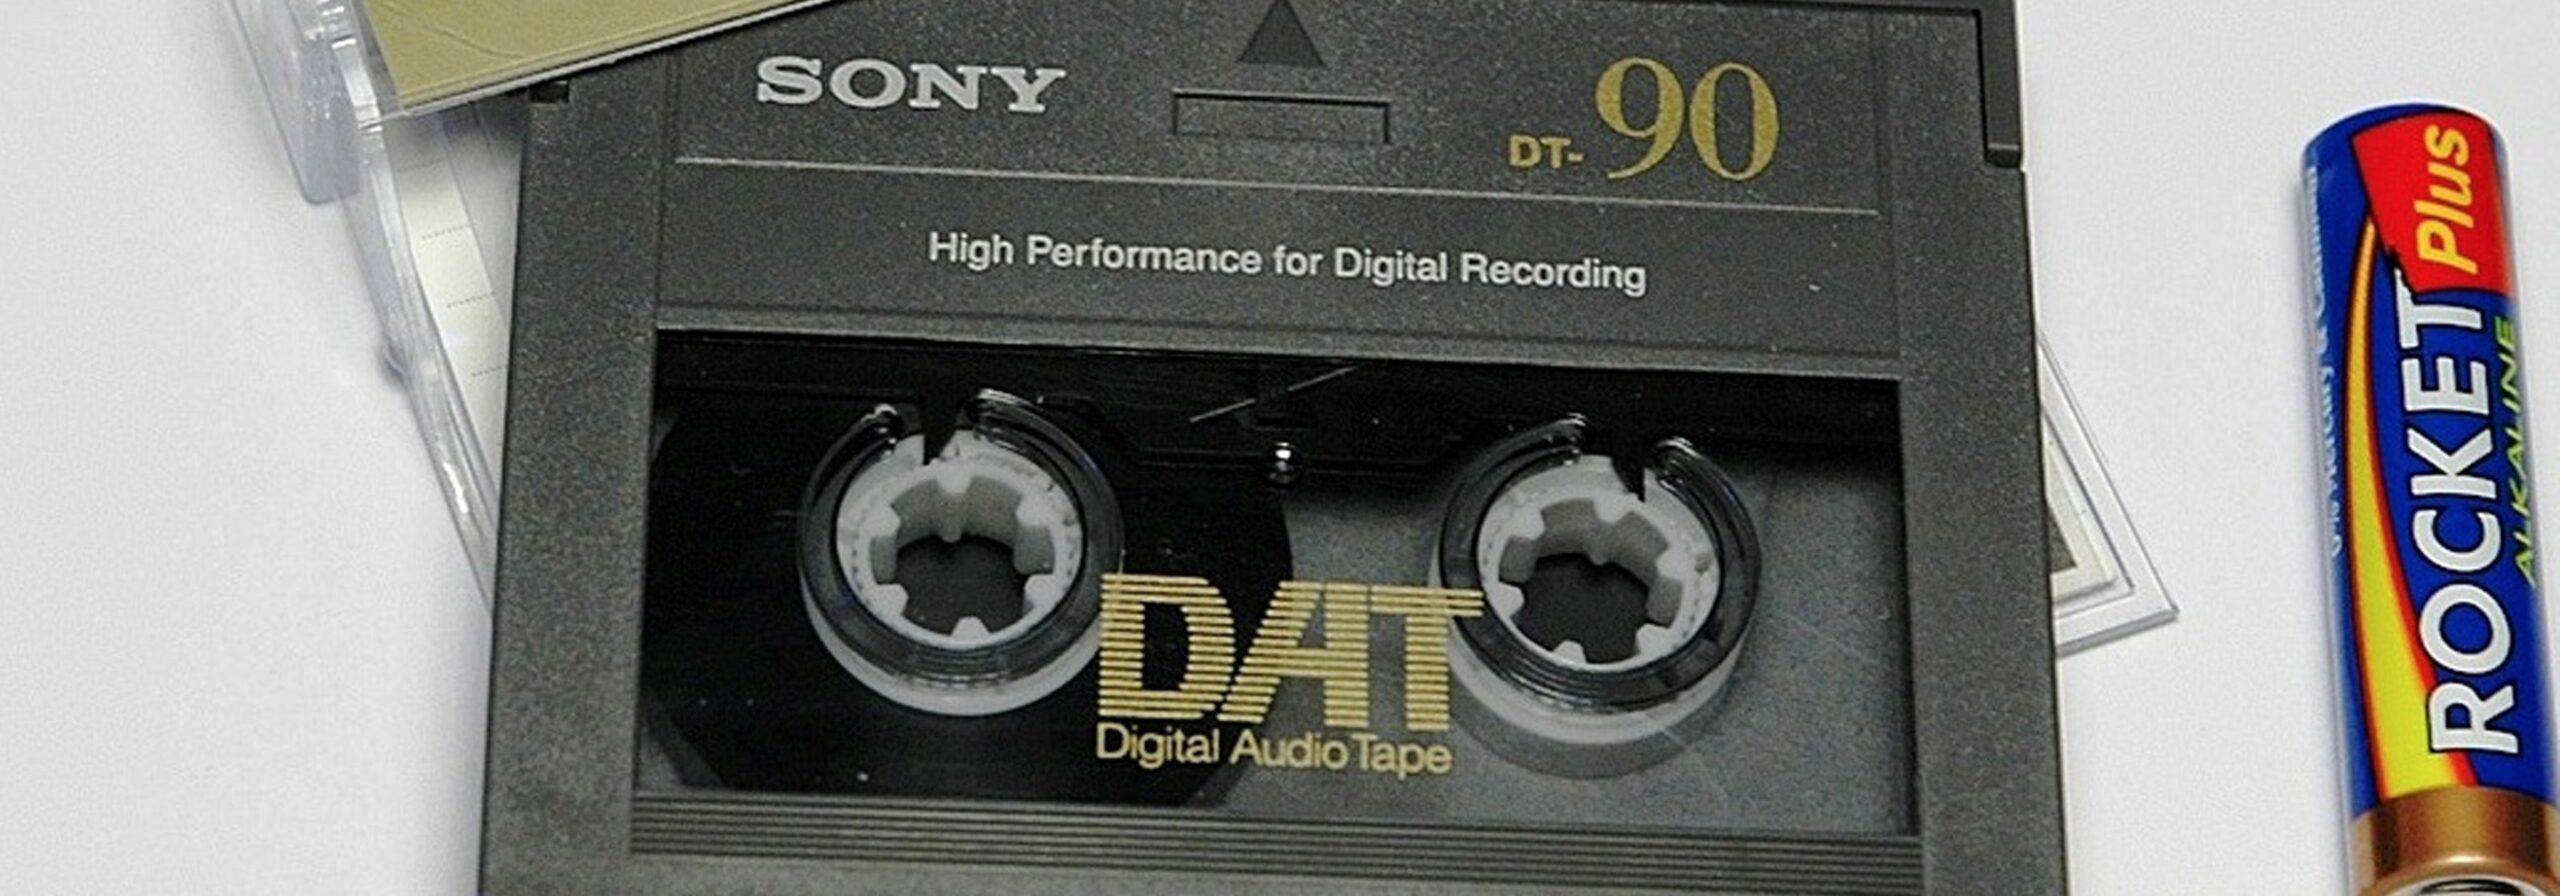 Sony's Digital Audio Tapes